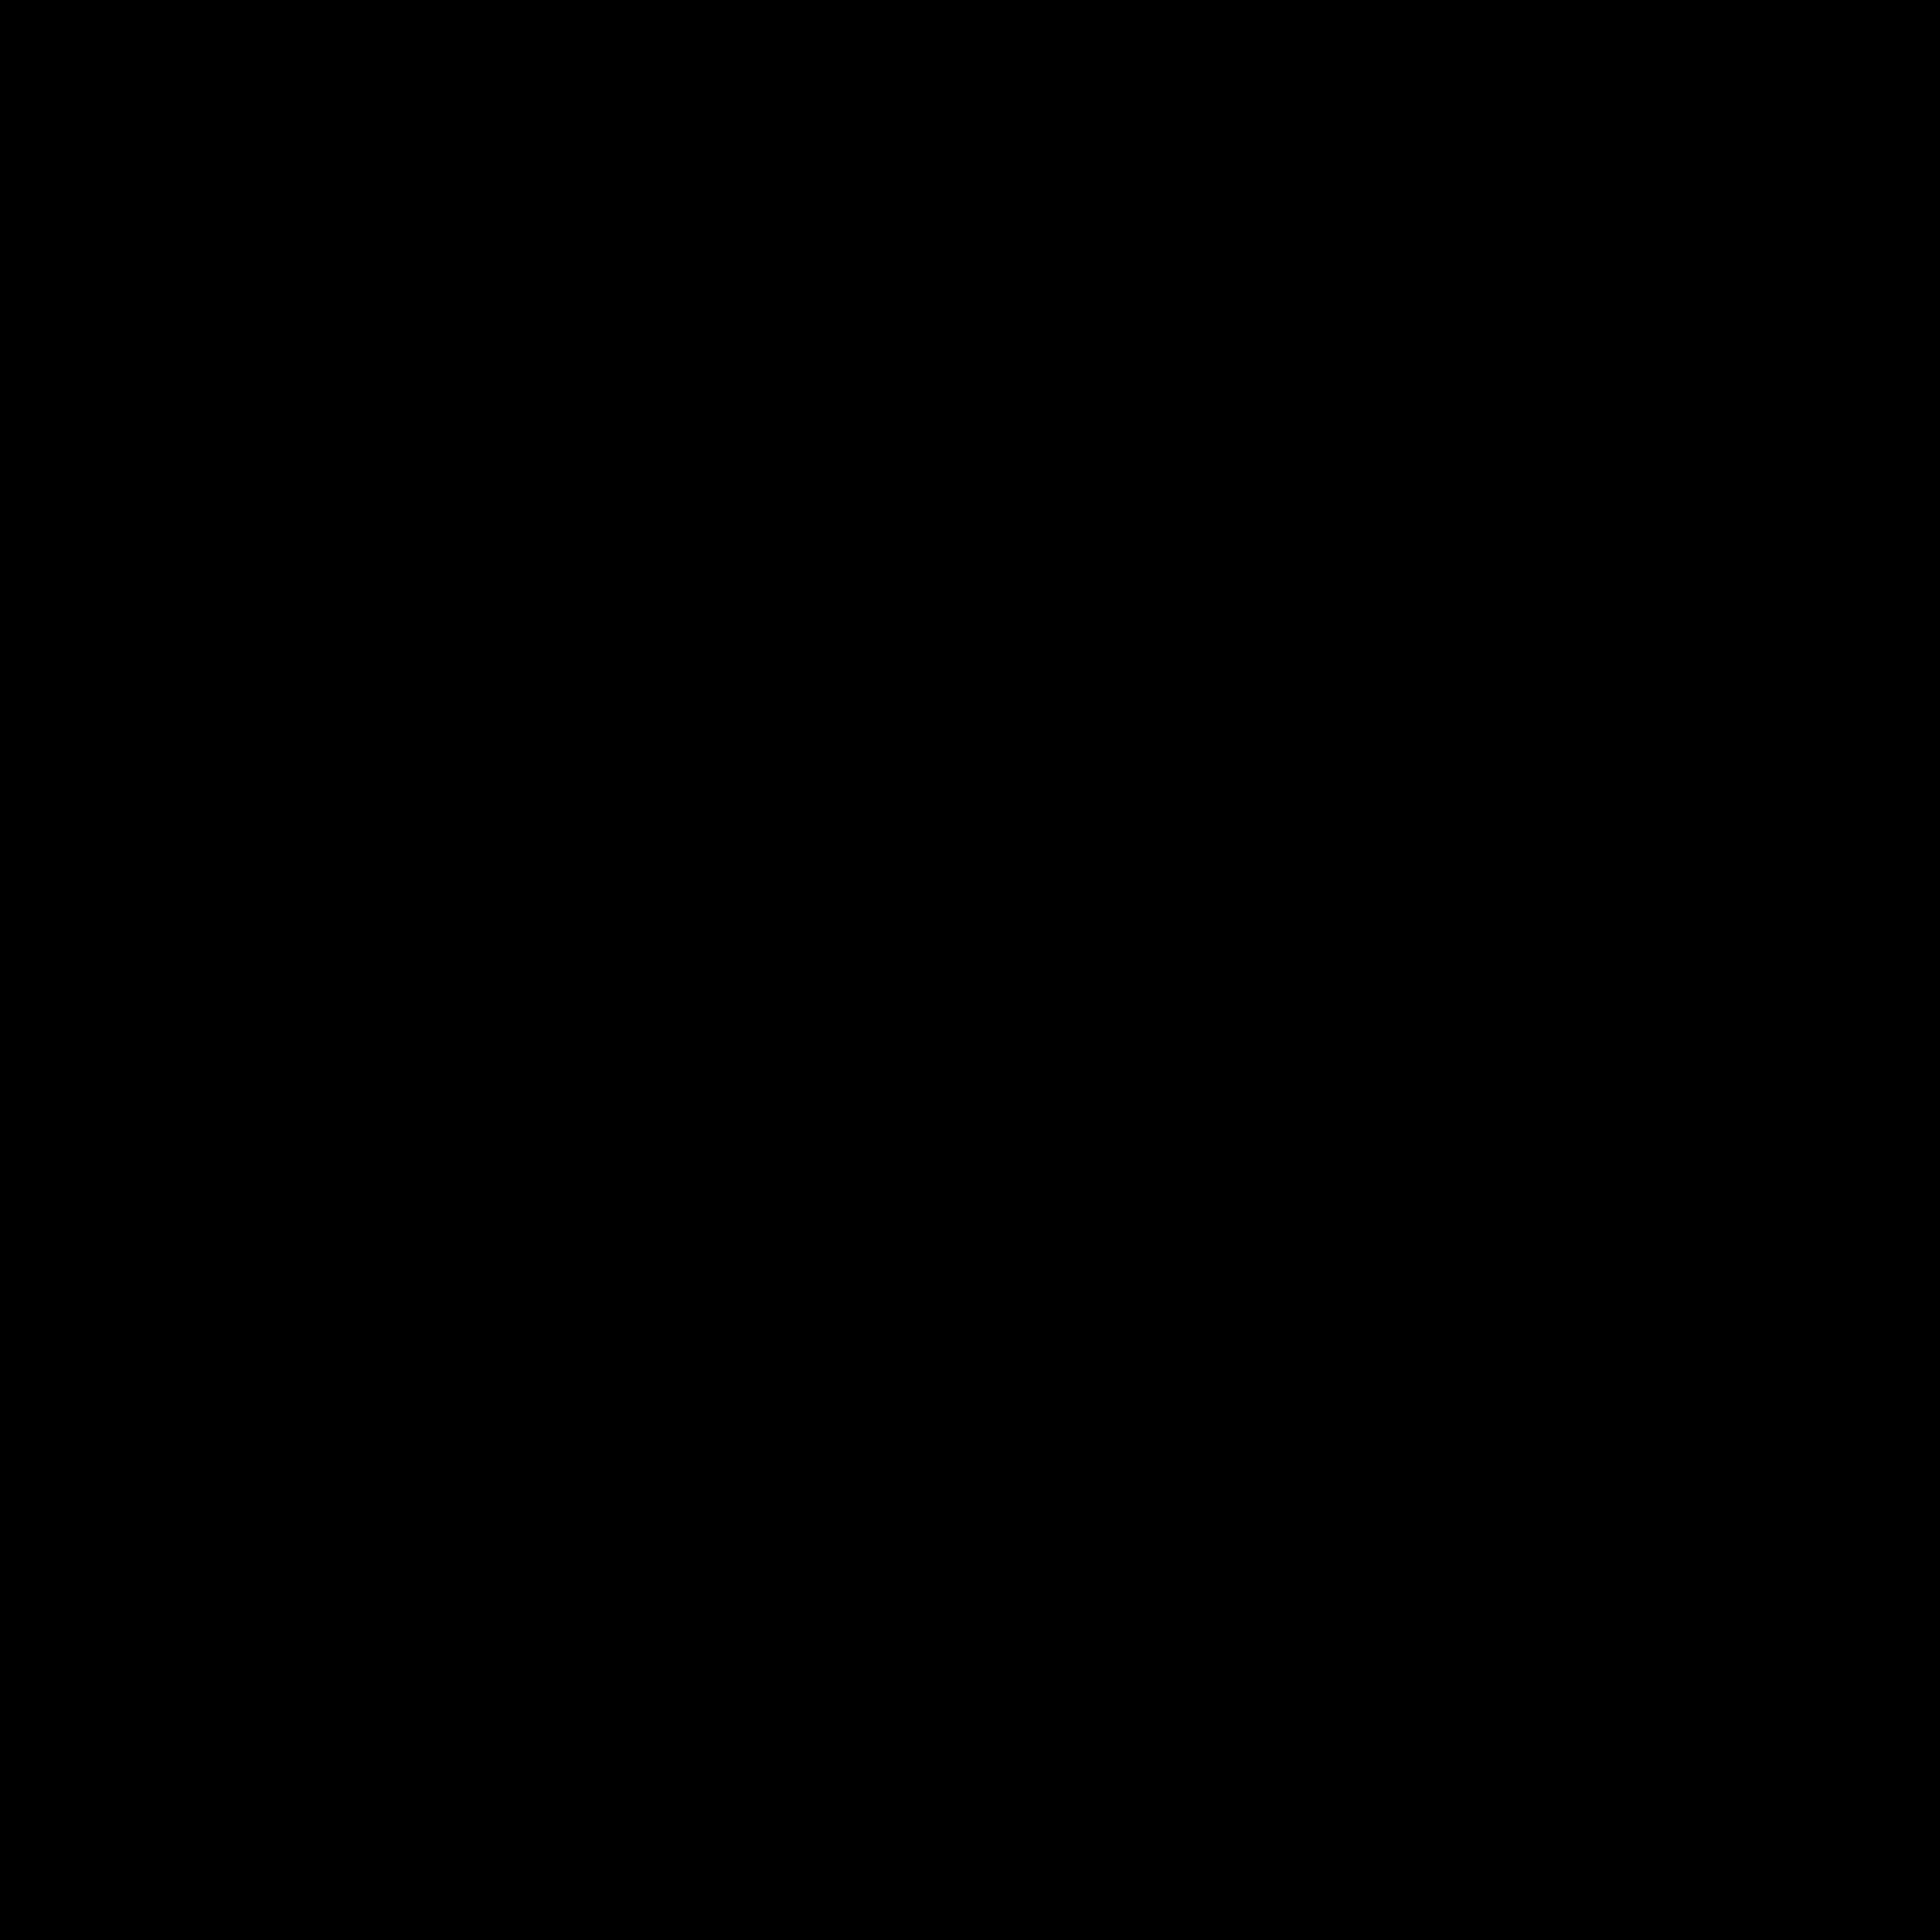 geberit-logo-black-and-white